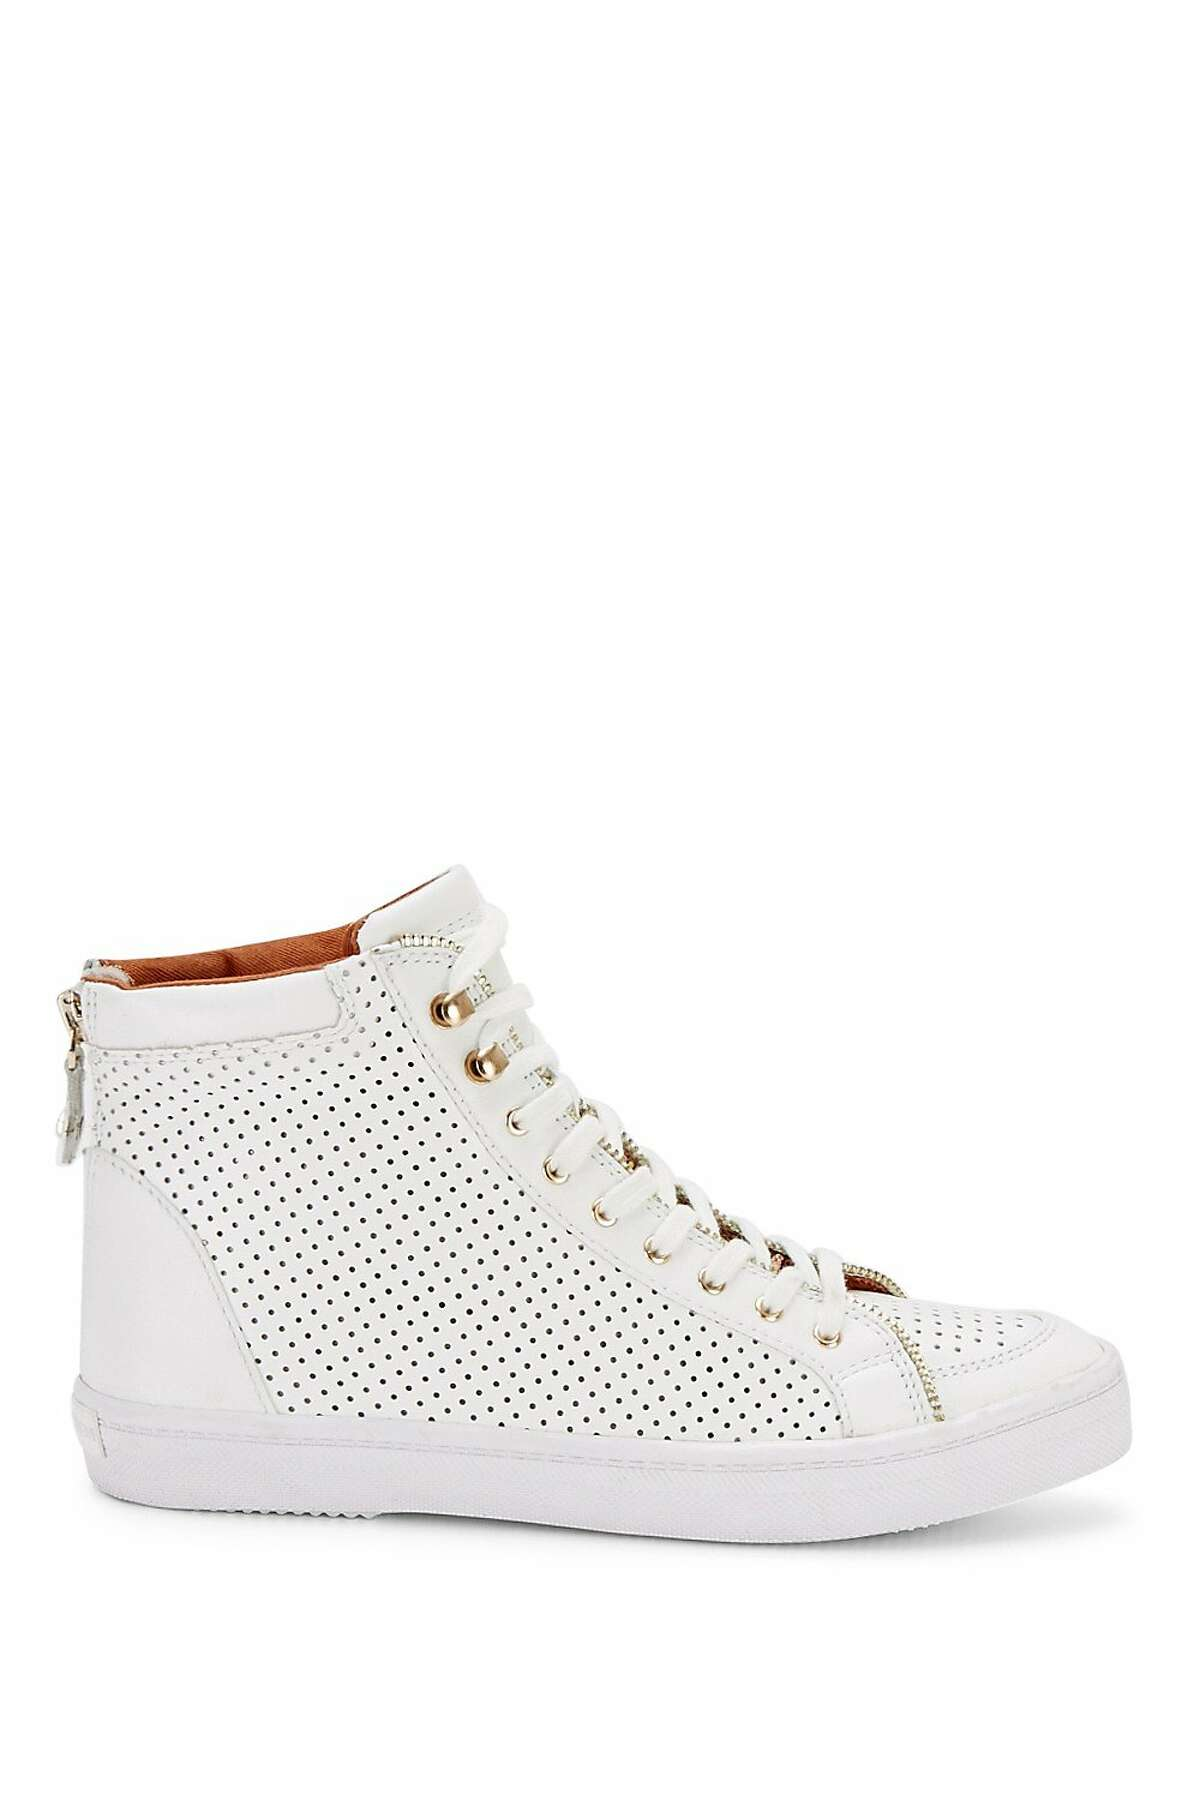 Sandi Perforated Sneaker, Rebecca Minkoff $225, www.rebeccaminkoff.com